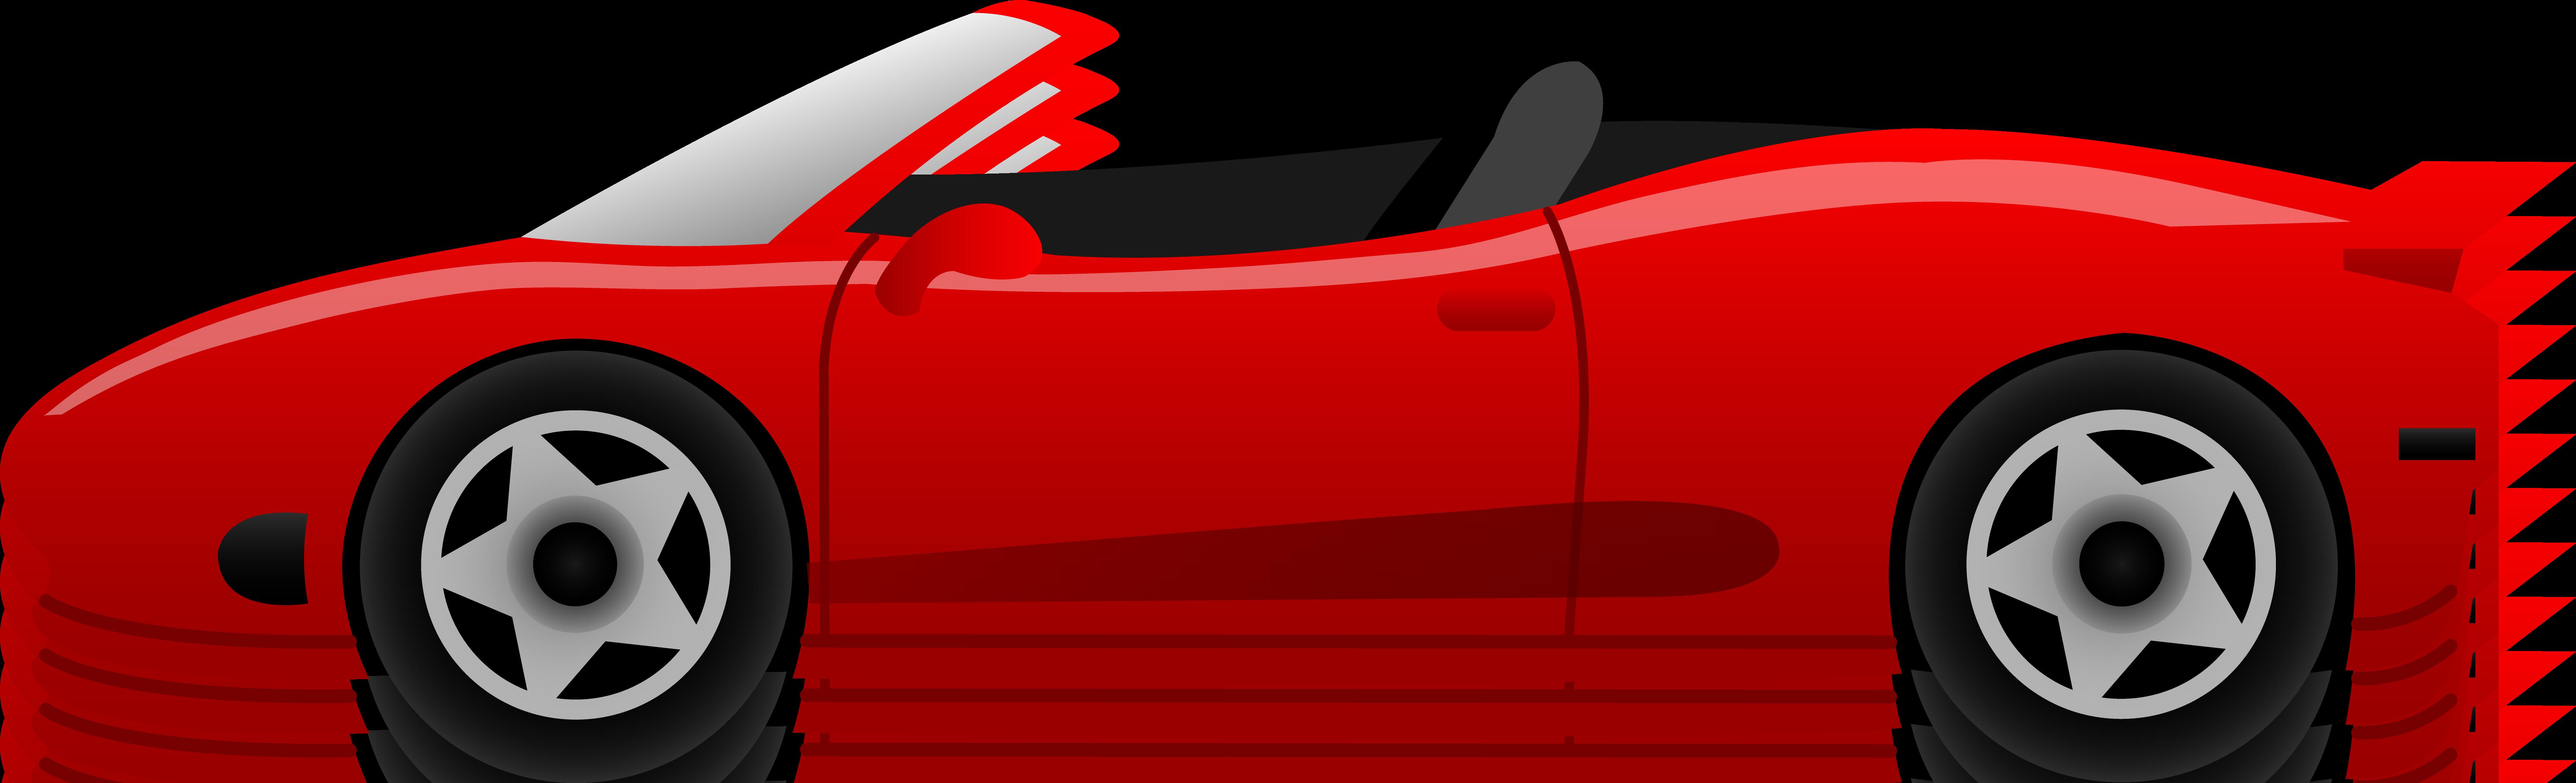 7863x2391 Clip Art Of Cars